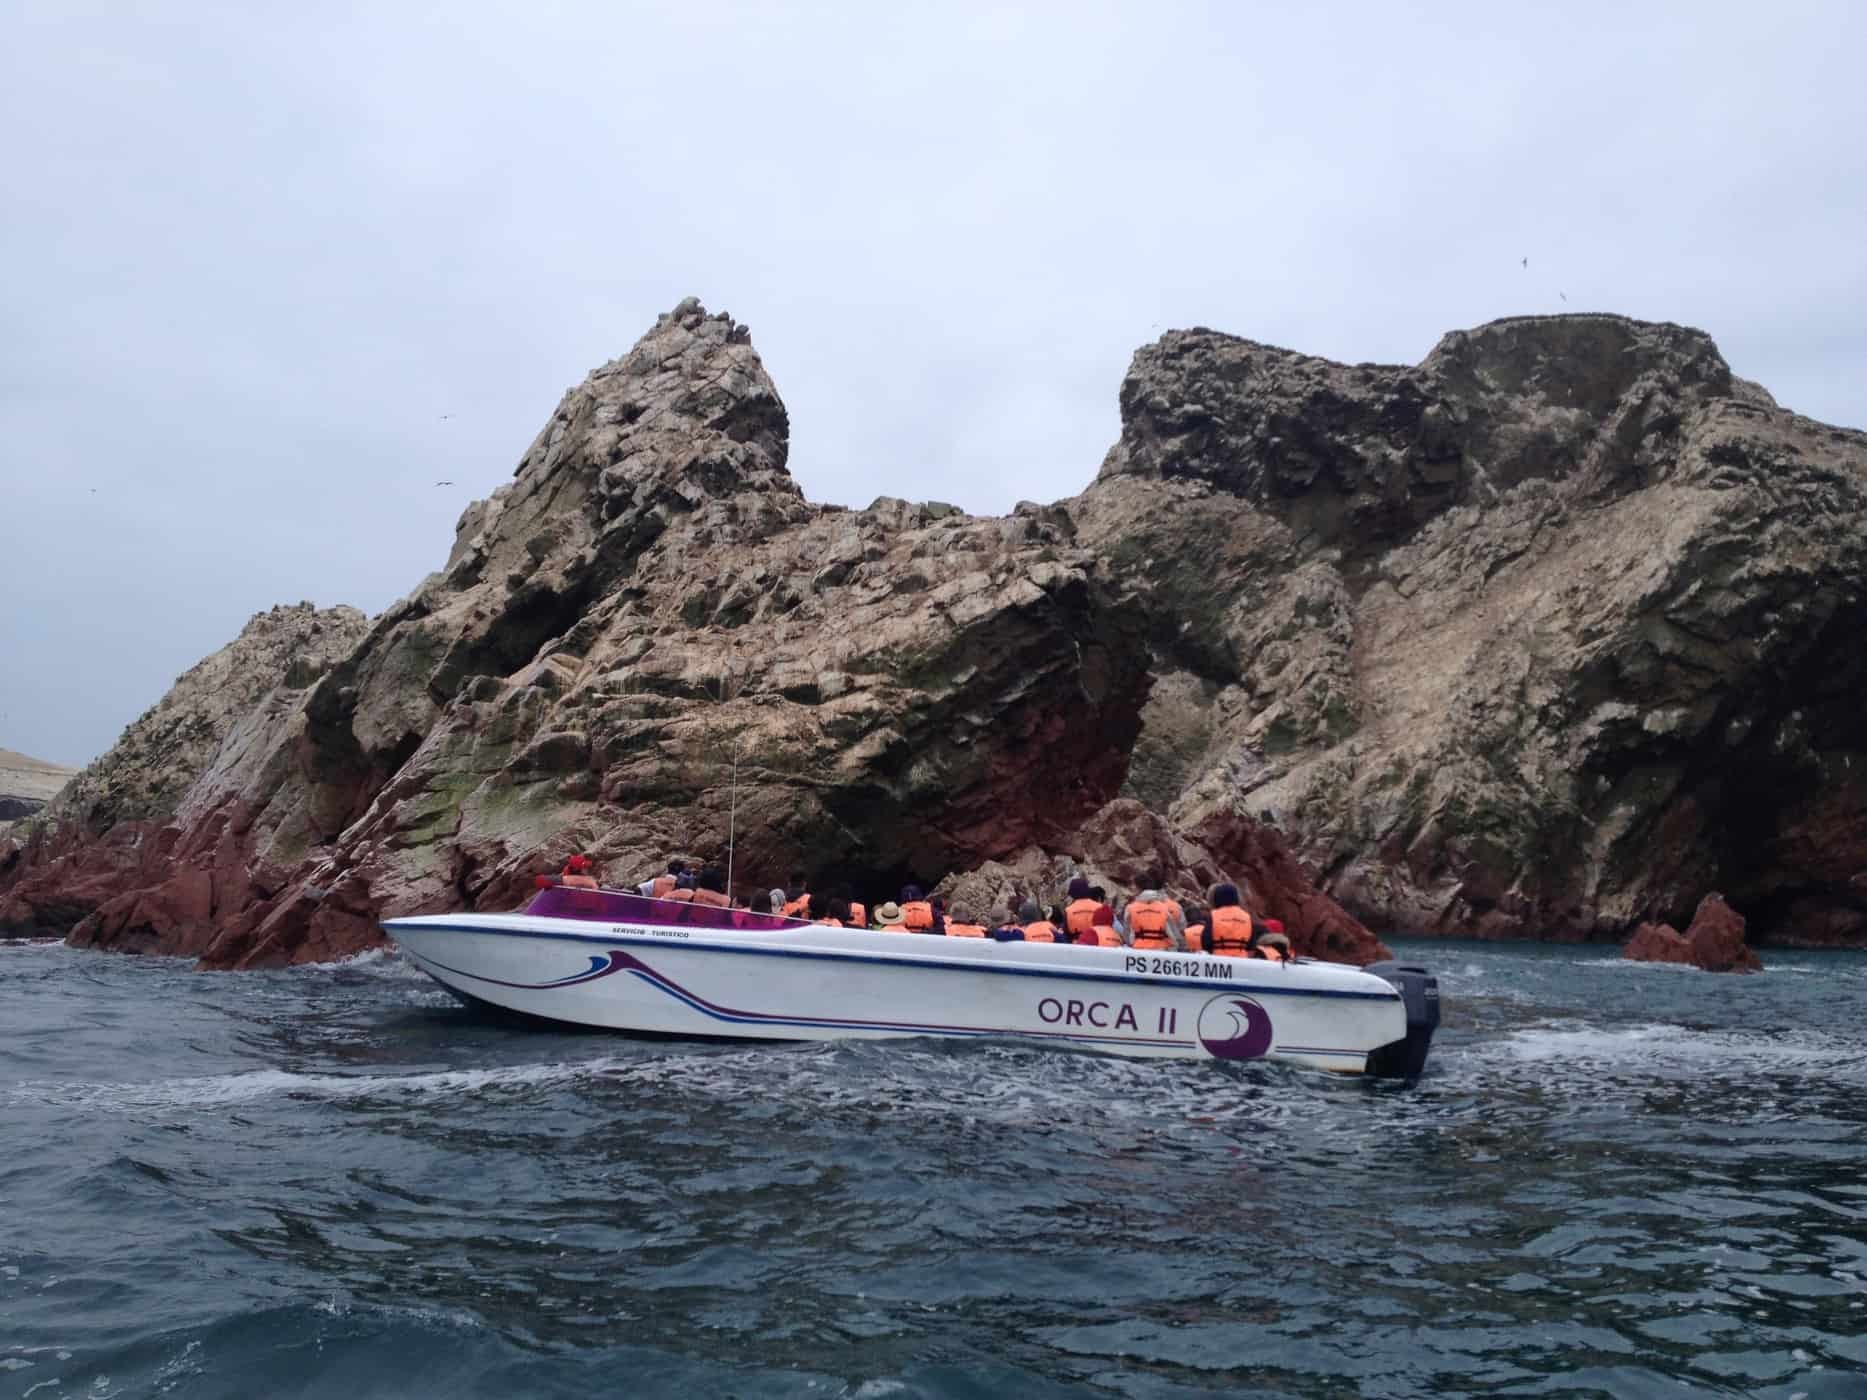 Boat trip to Islas Ballestas from Paracas Peru